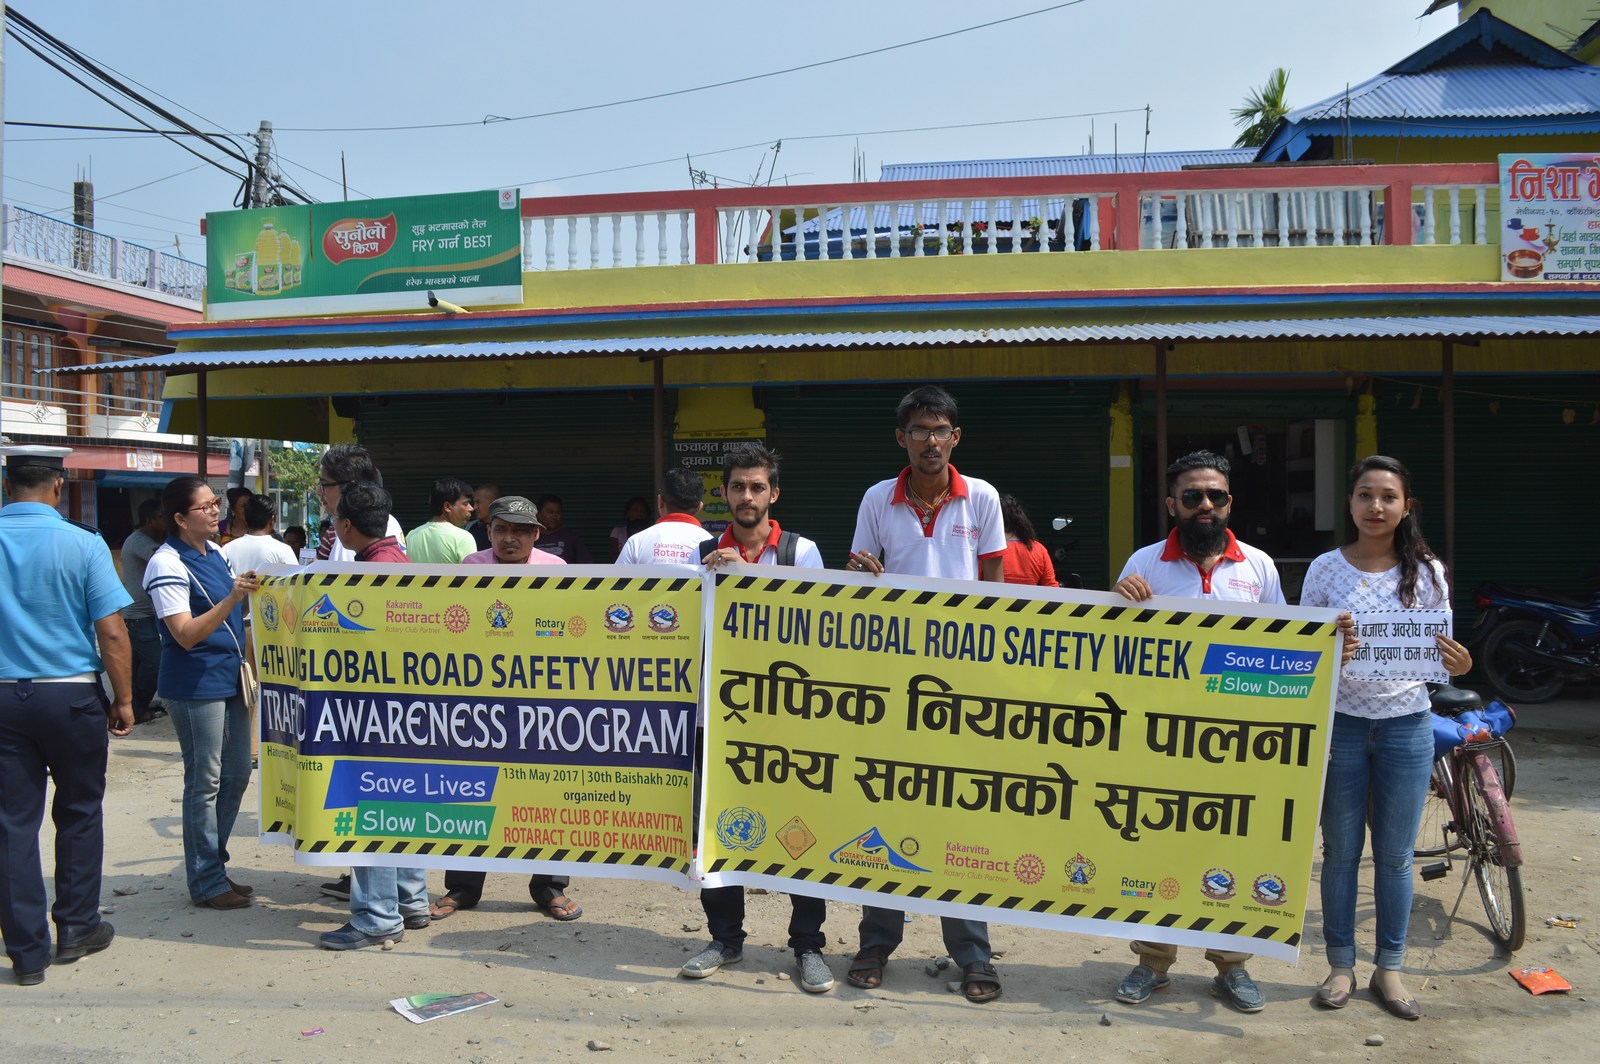 4th-UN-Global-Road-Safety-Week-2017-Traffic-Awareness-Program-Rotary-club-of-Kakarvitta-55